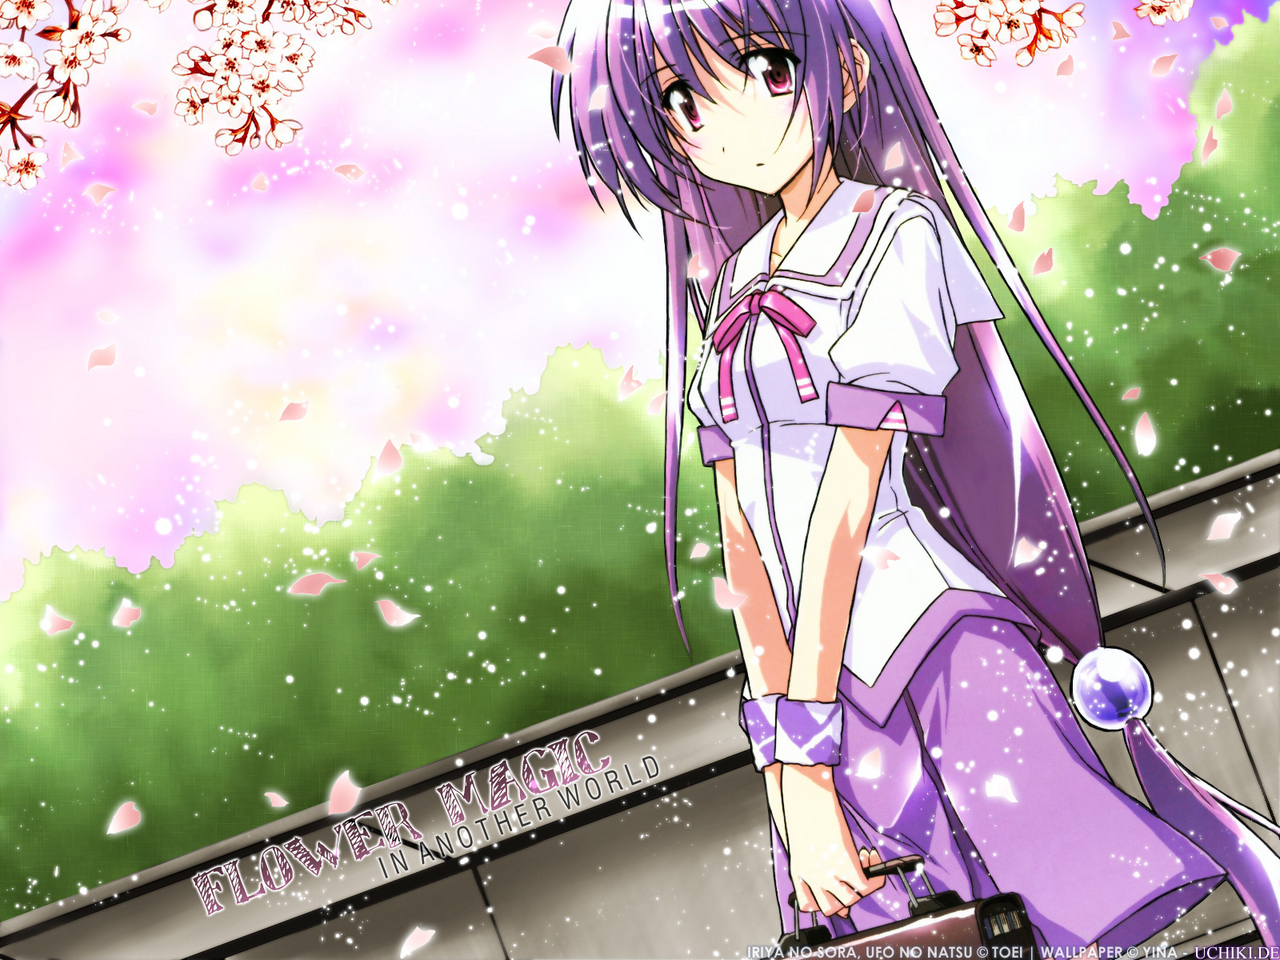 cherry_blossoms flowers iriya_kana iriya_no_sora_ufo_no_natsu long_hair petals purple_hair red_eyes school_uniform watermark